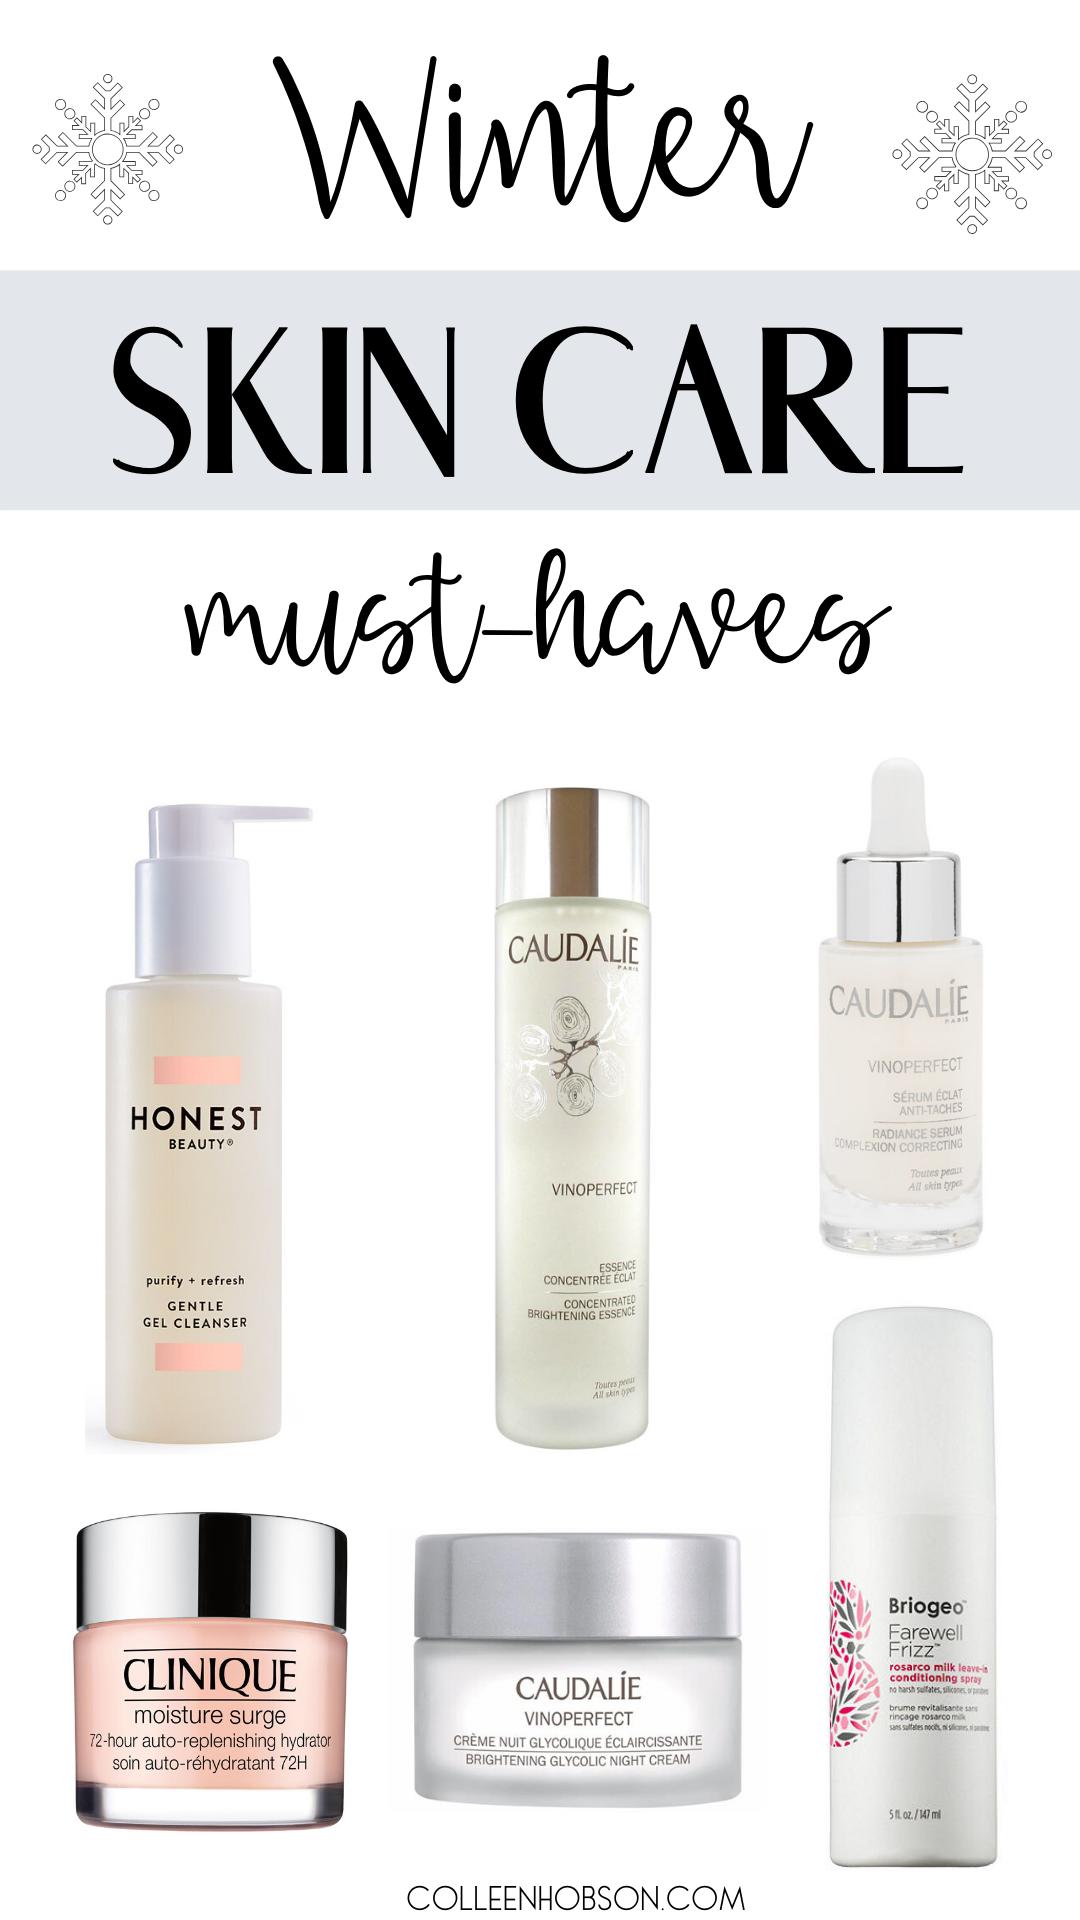 Amazing Skincare Routine For Dry Winter Skin Colleen Hobson Winter Skin Care Brightening Skincare Winter Skin